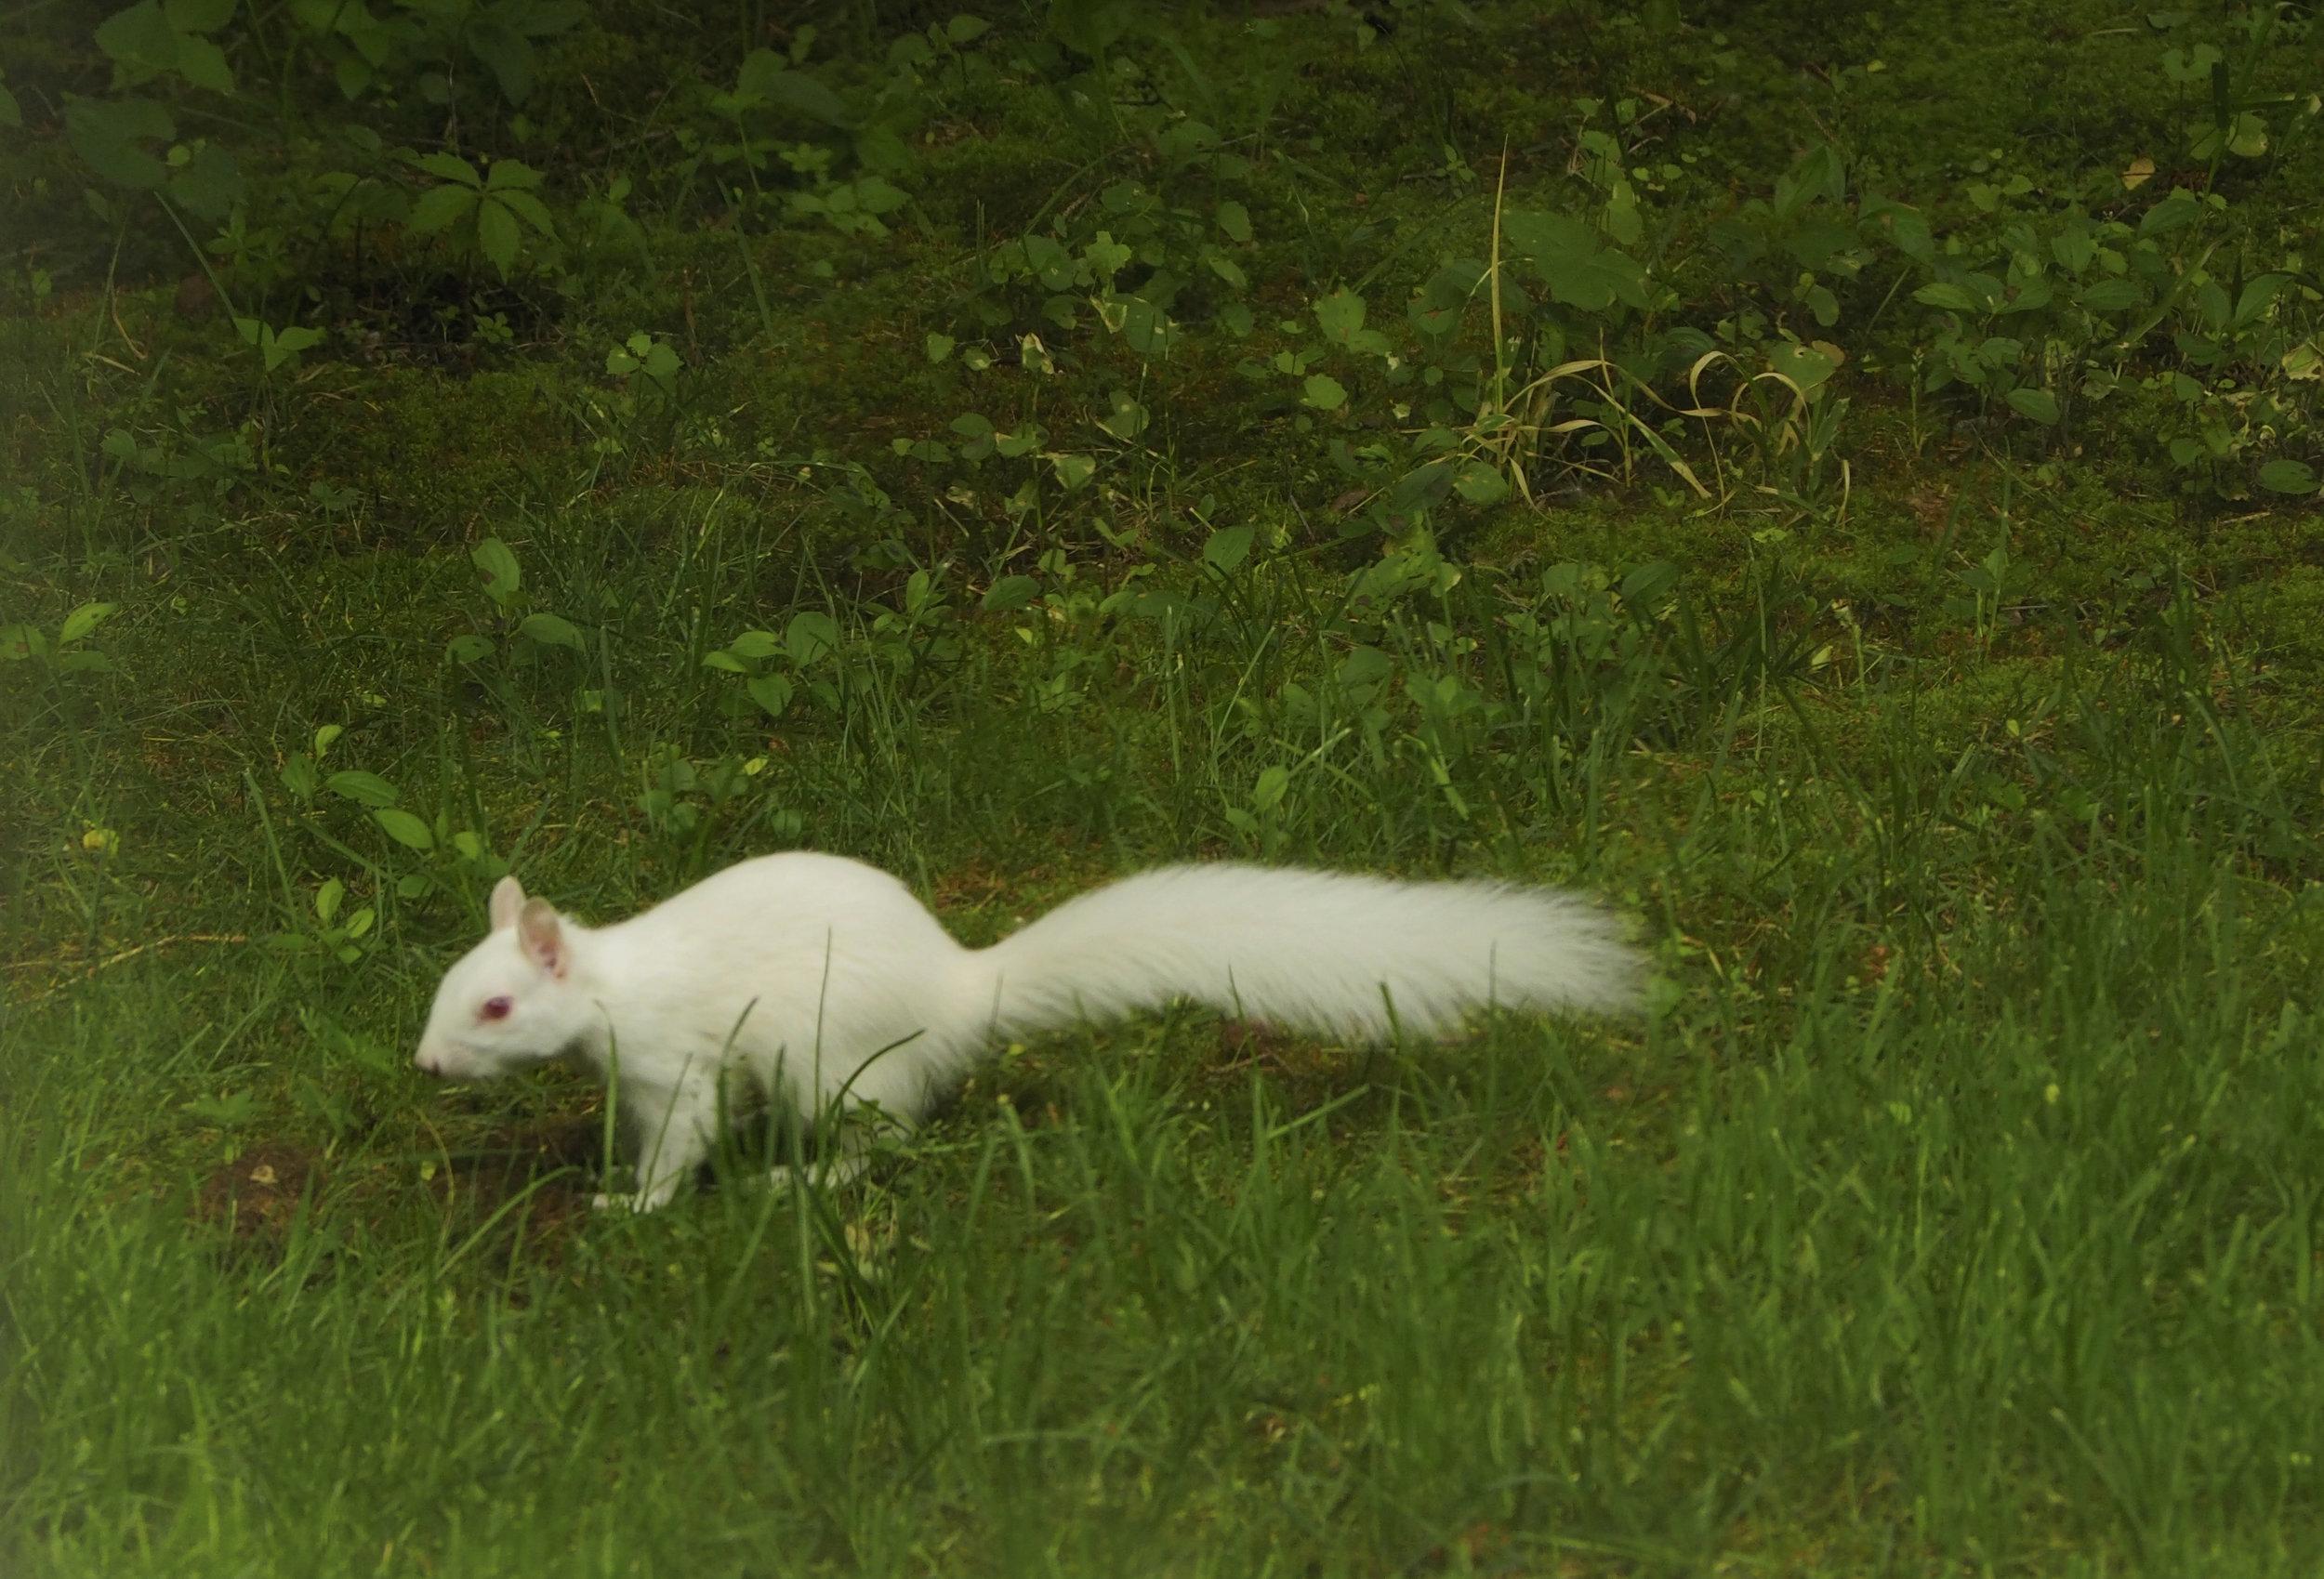 cindi_albino_squirrel_spiritedtable_photo1.jpg